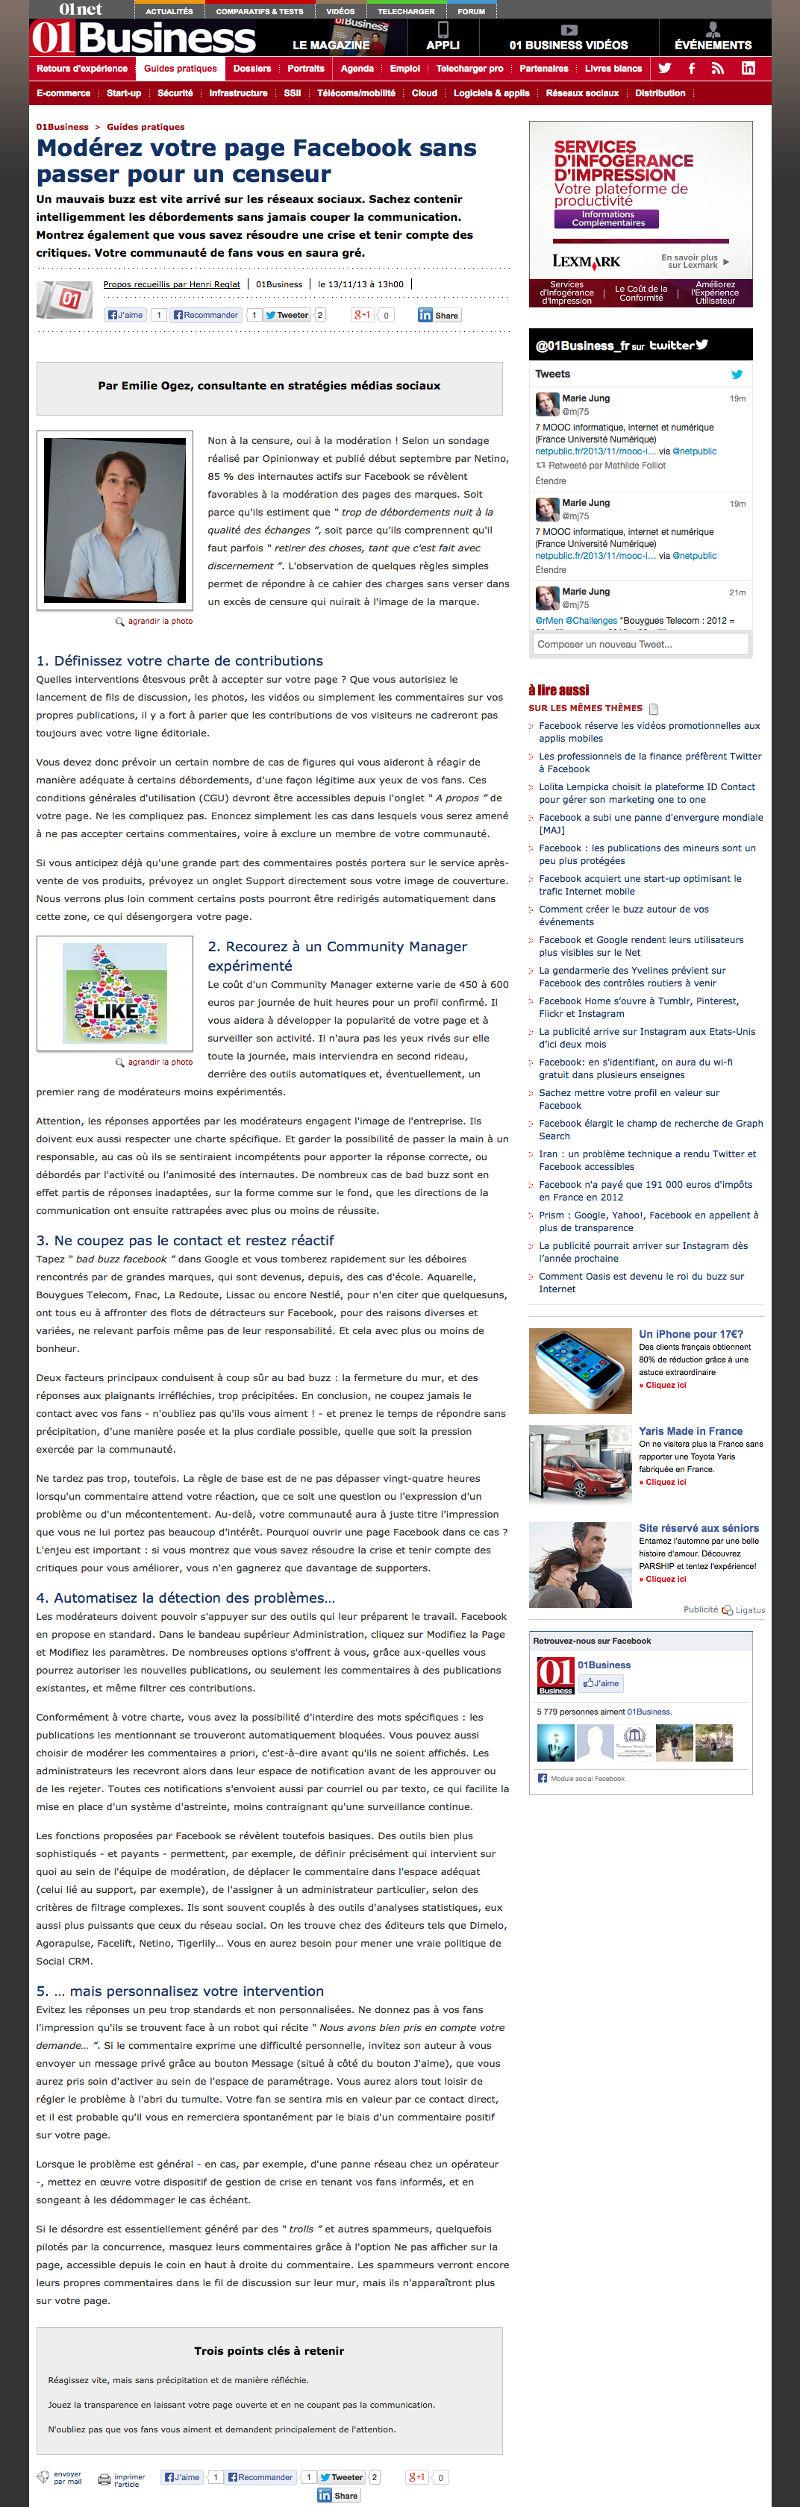 Moderez-page-Facebook-censeur-01net-emilie-ogez